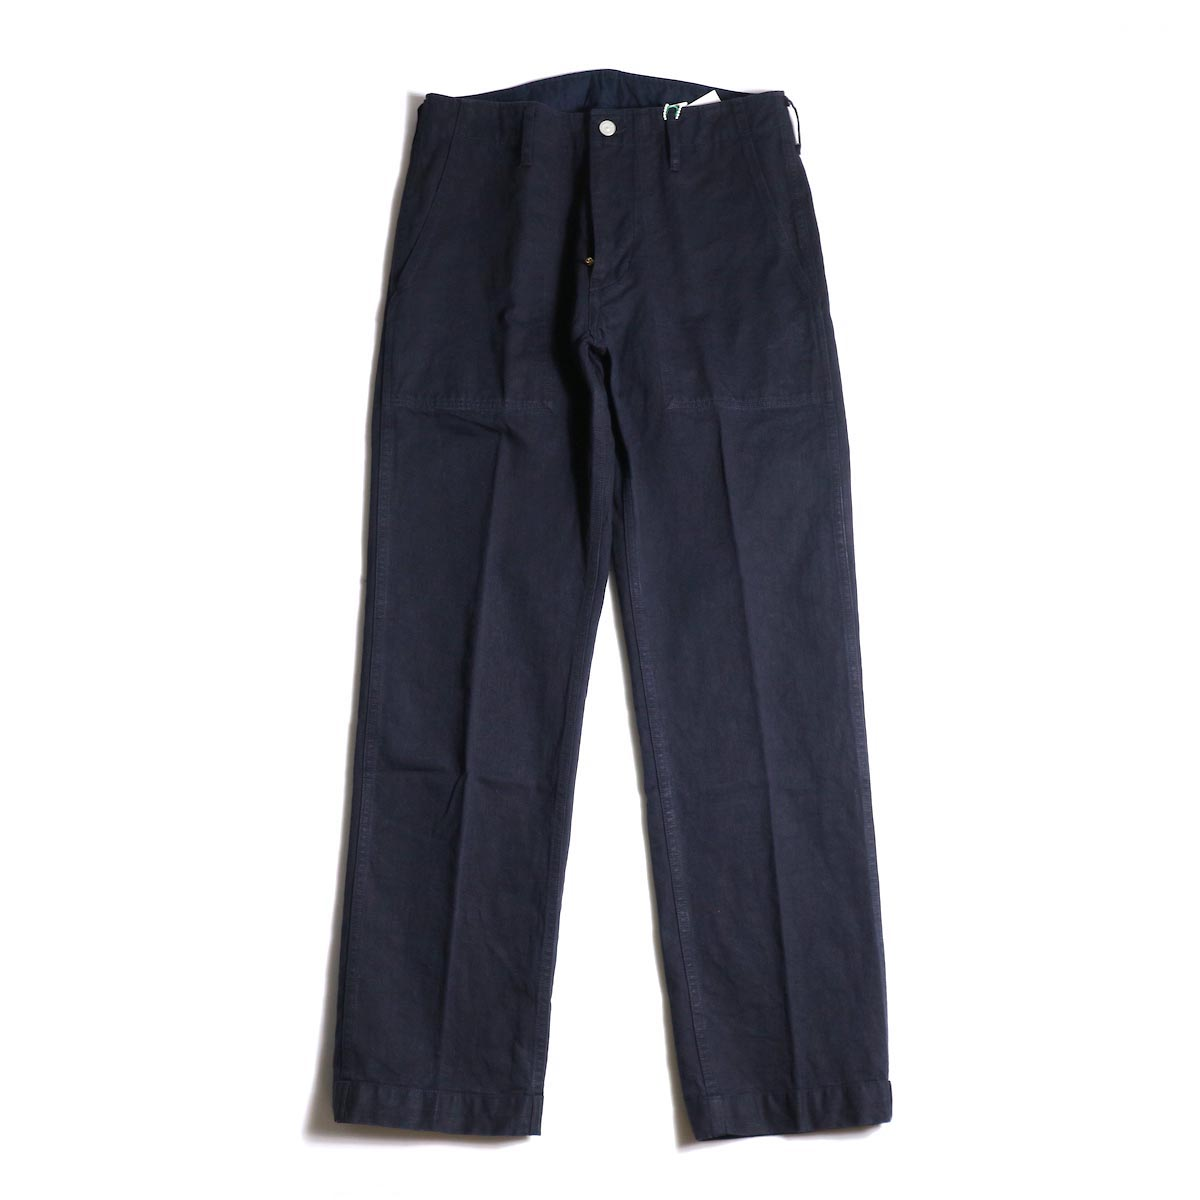 visvim / TRADE WIND PANTS (Navy)